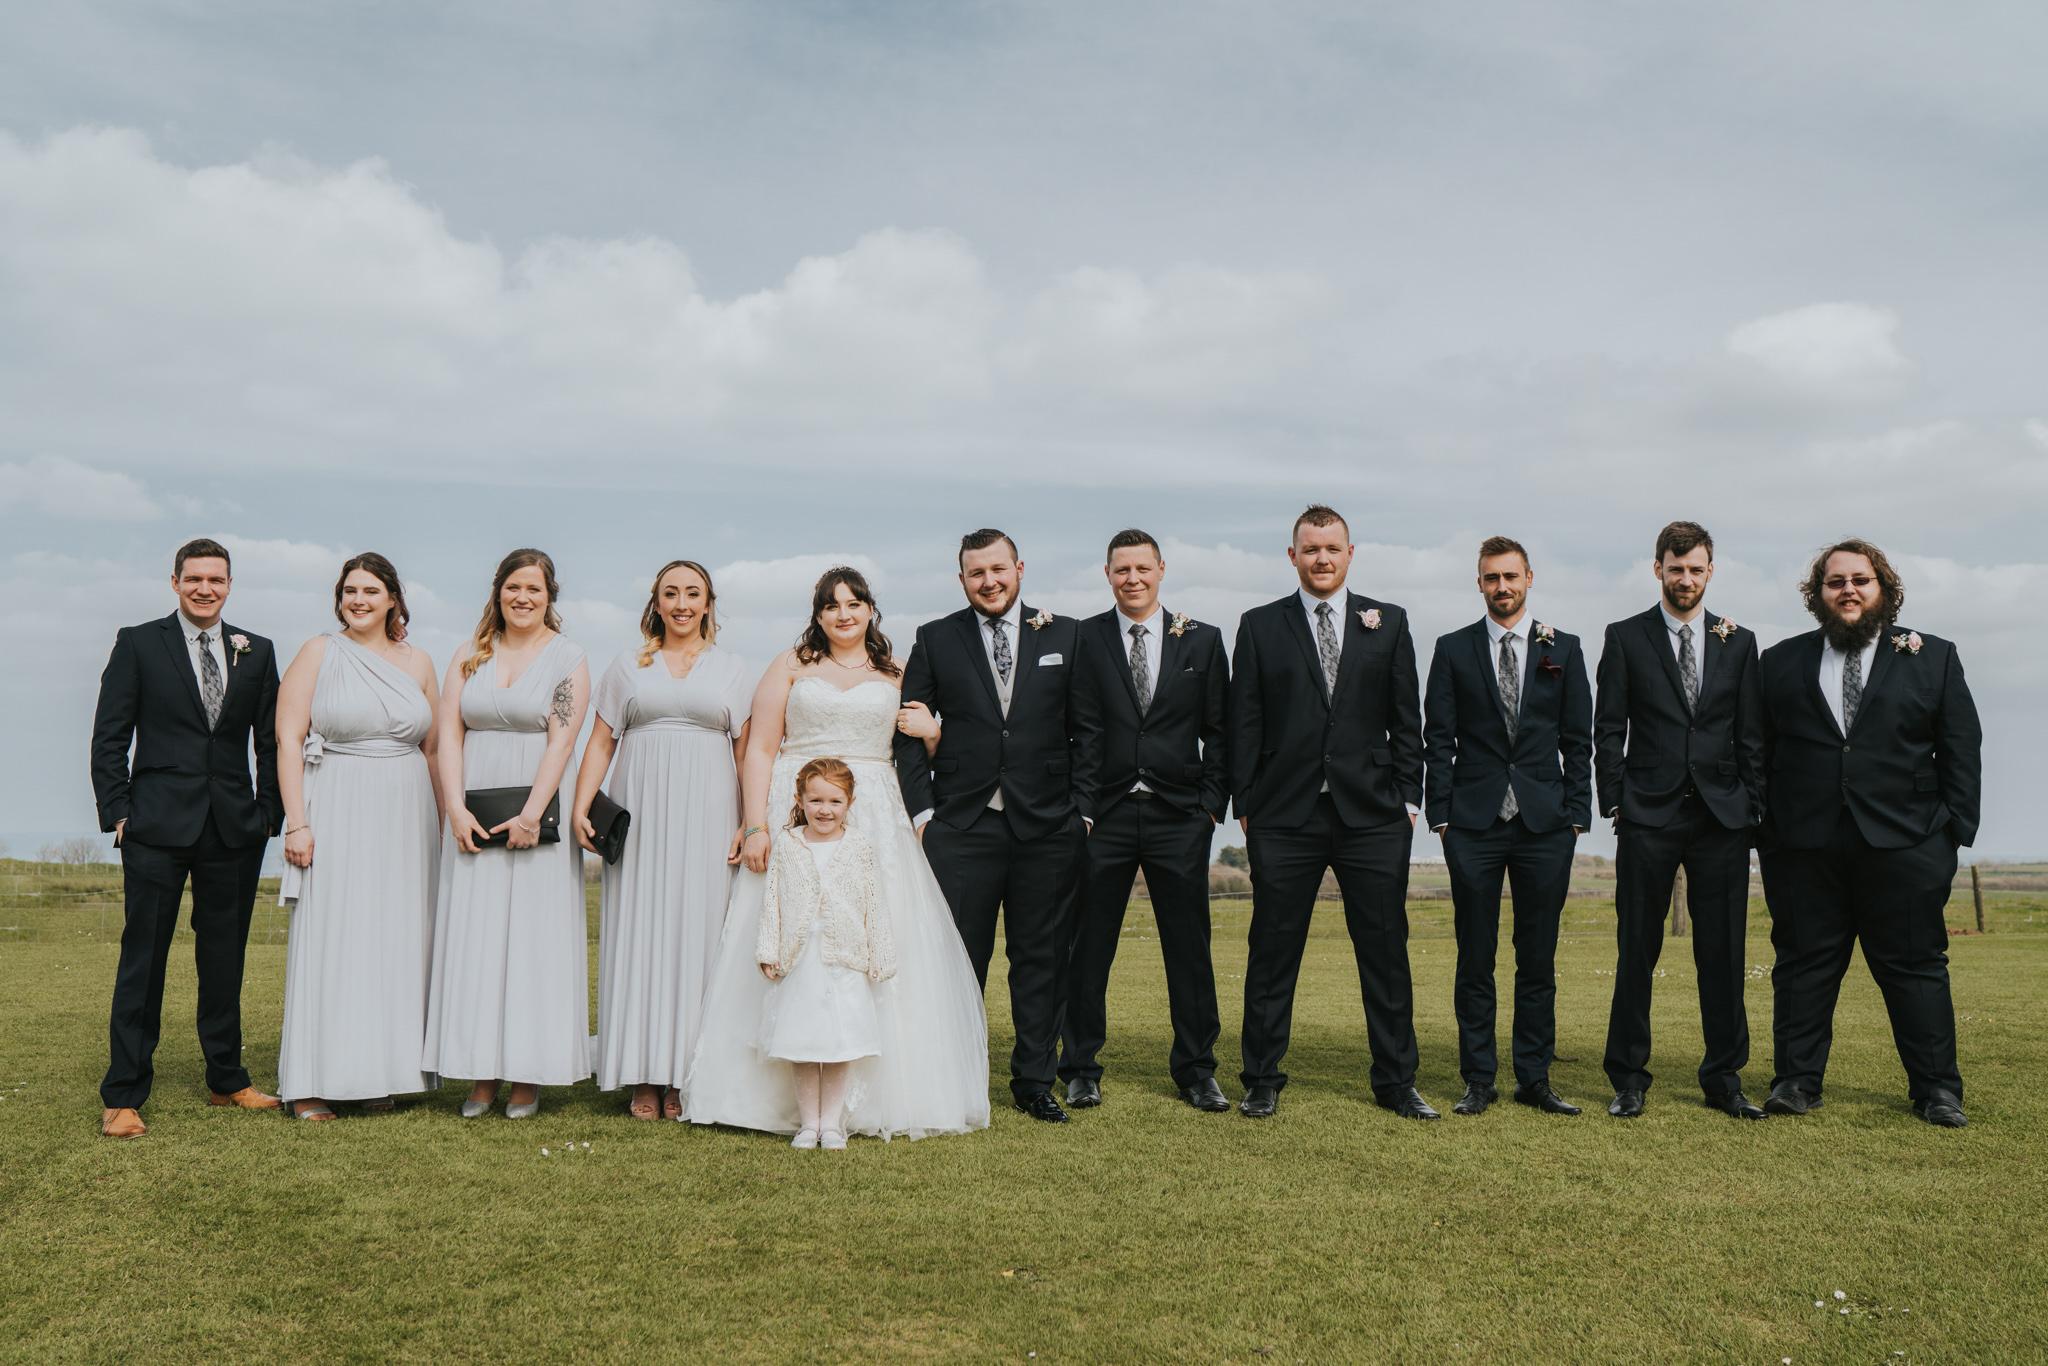 grace-sam-old-barn-clovelly-devon-wedding-photographer-grace-elizabeth-essex-suffolk-norfolk-wedding-photographer (75 of 132).jpg